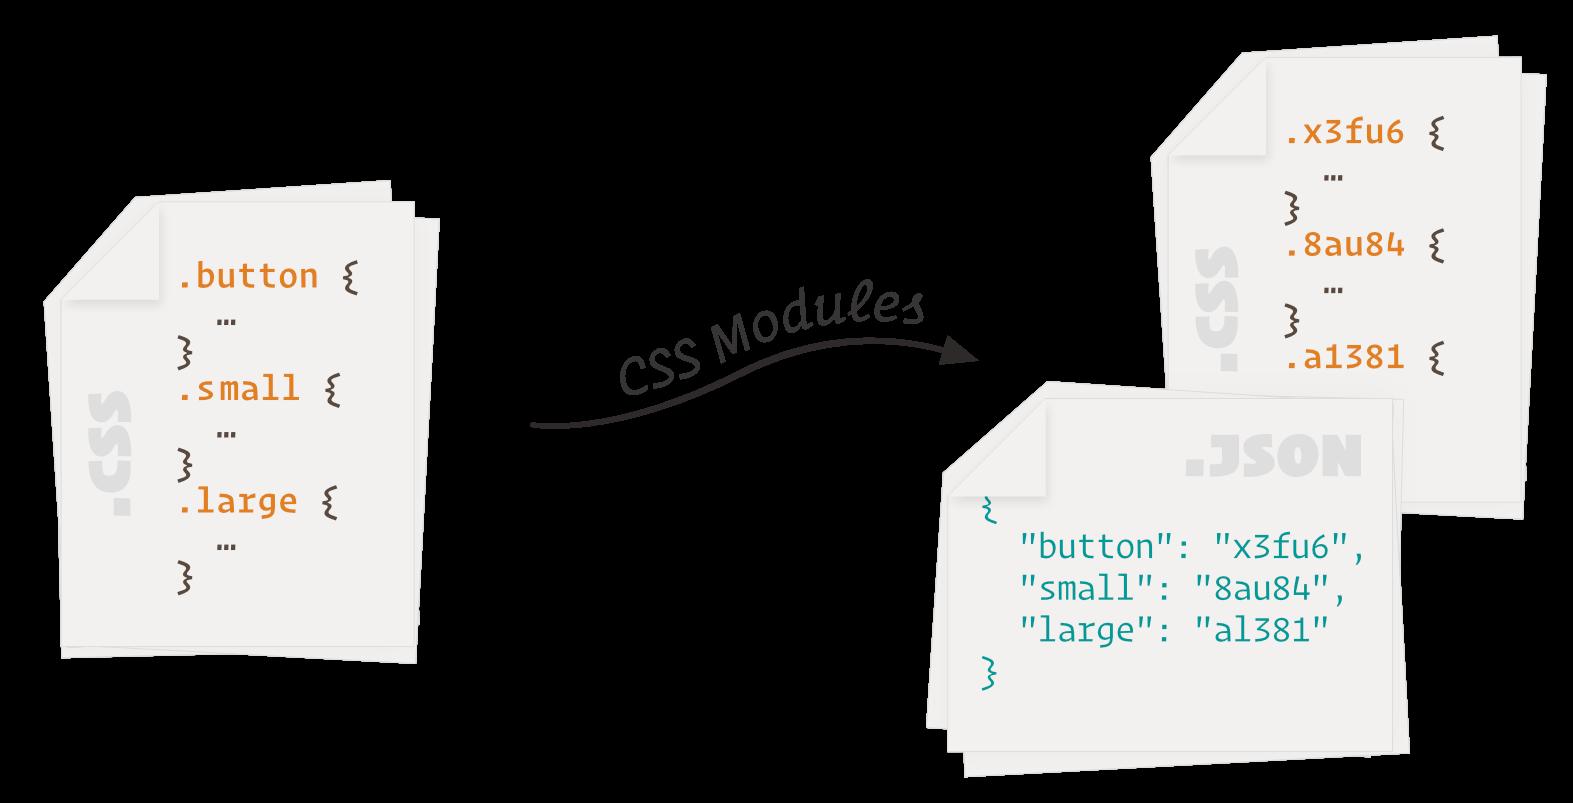 CSS Modules demo